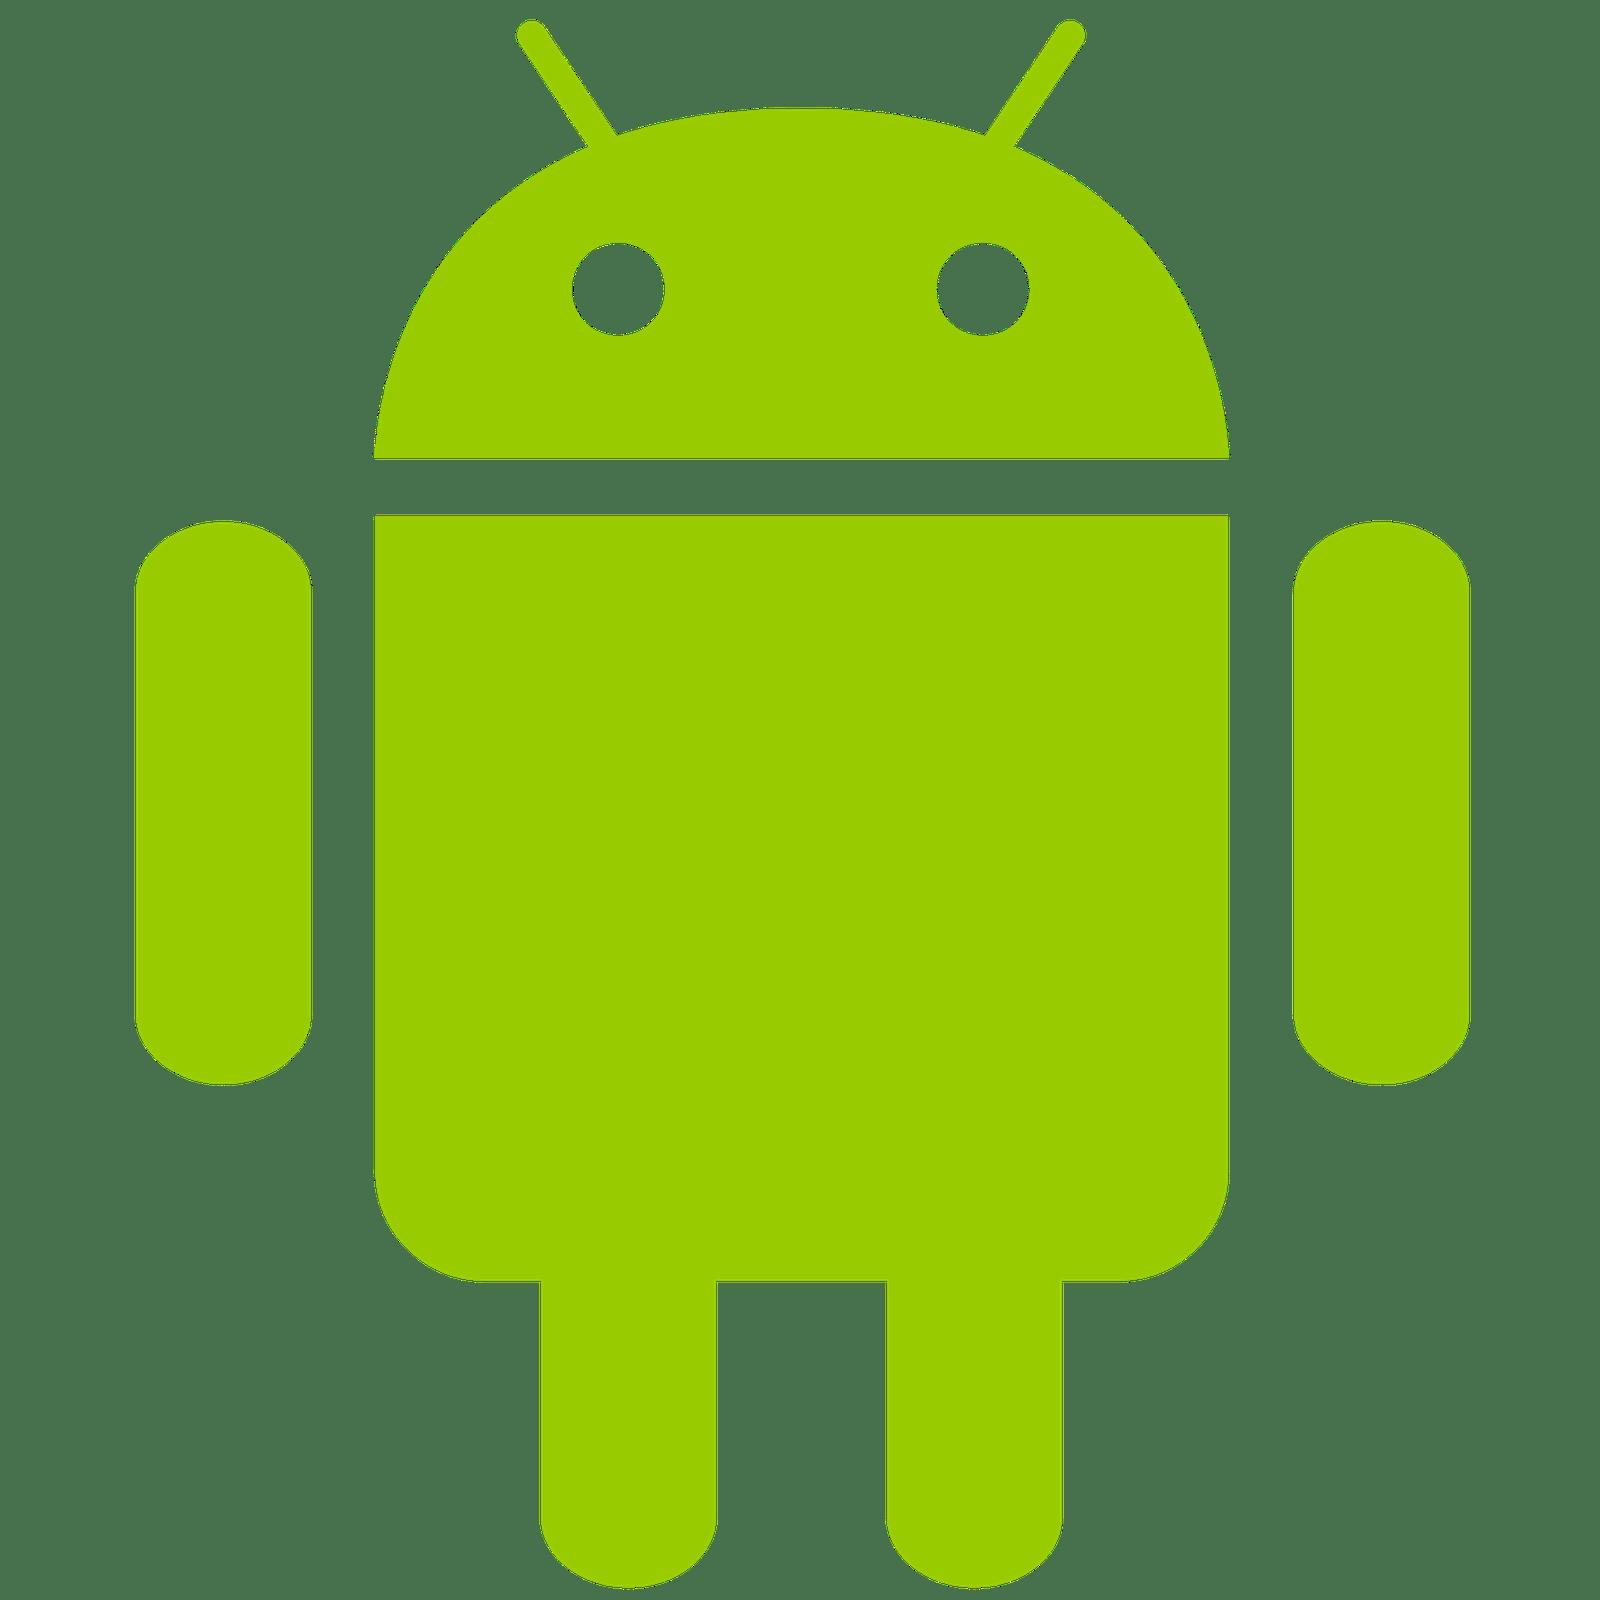 https://i1.wp.com/blog.appliedis.com/wp-content/uploads/2013/11/android1.png